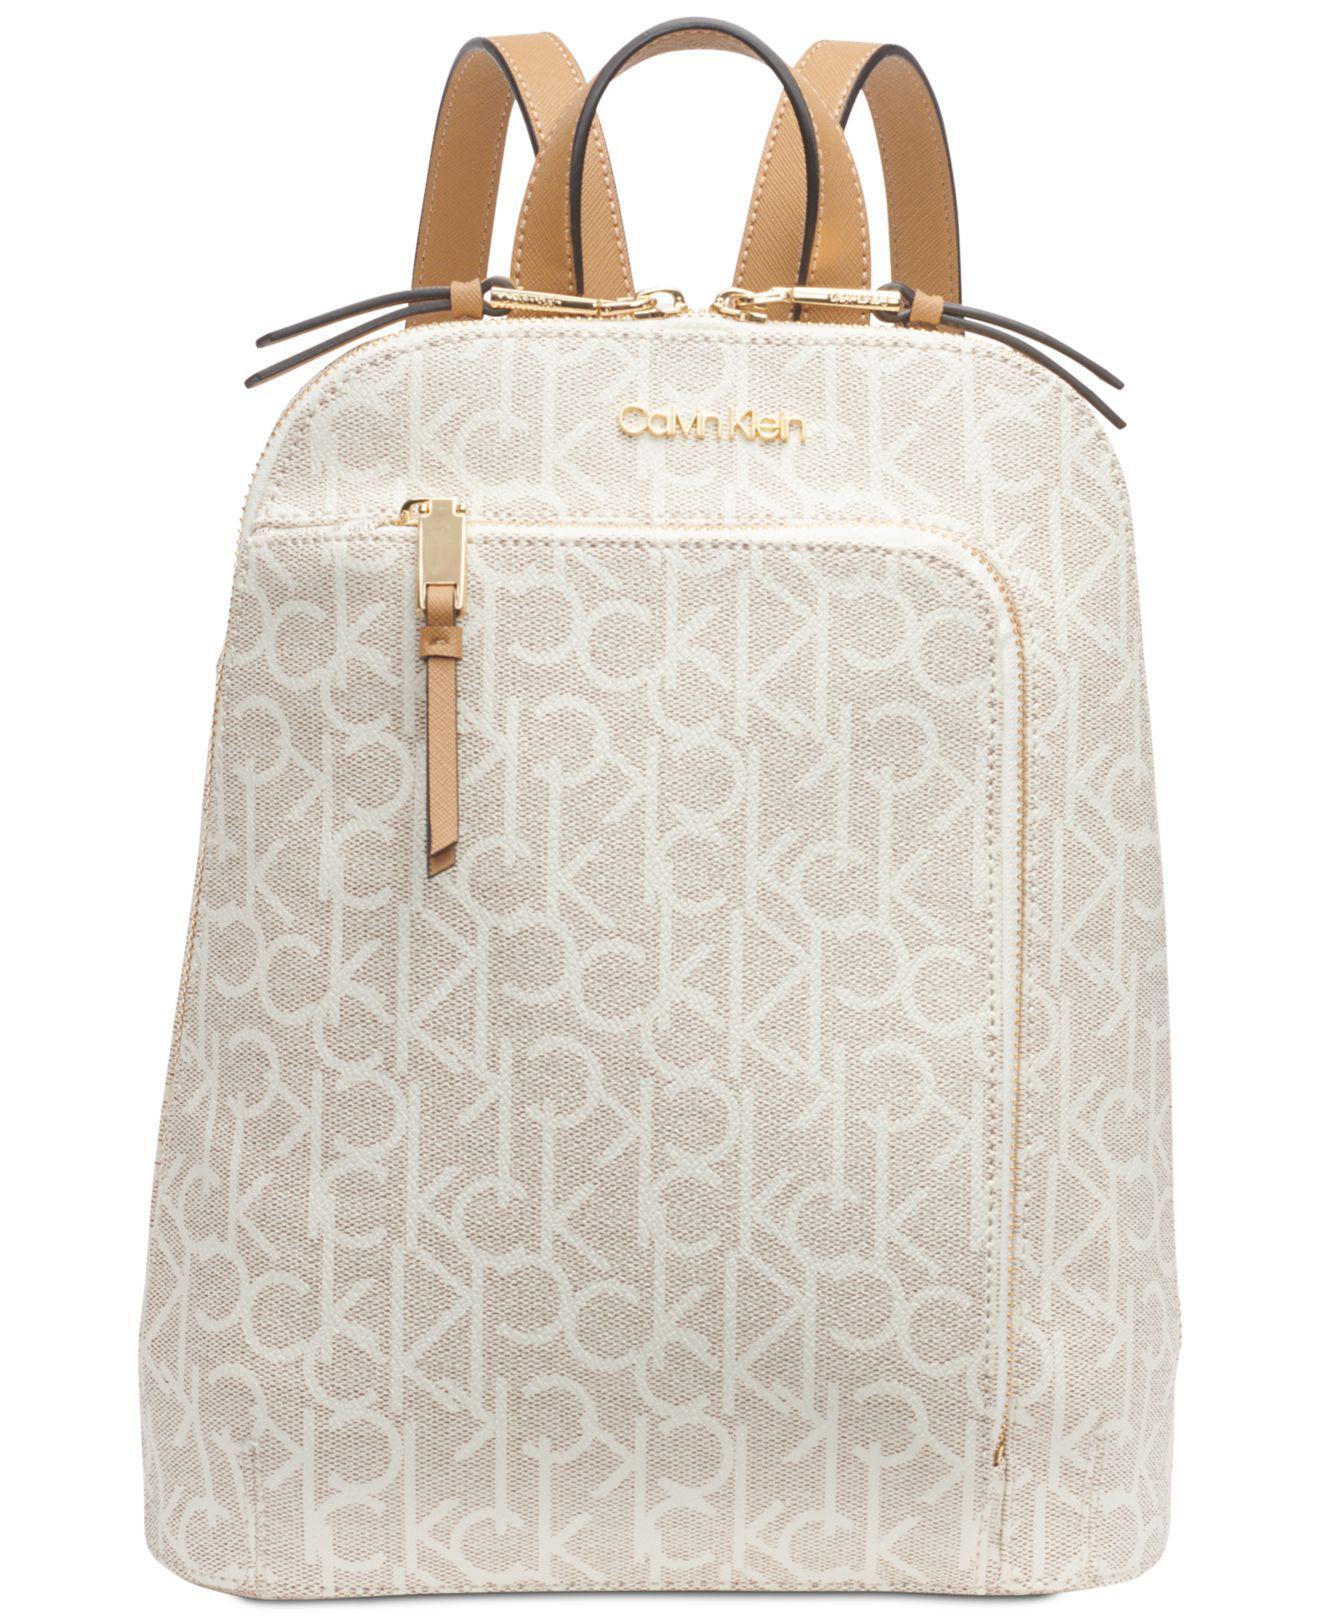 77a77b1435b0 Calvin Klein. Women s Hudson Signature Backpack